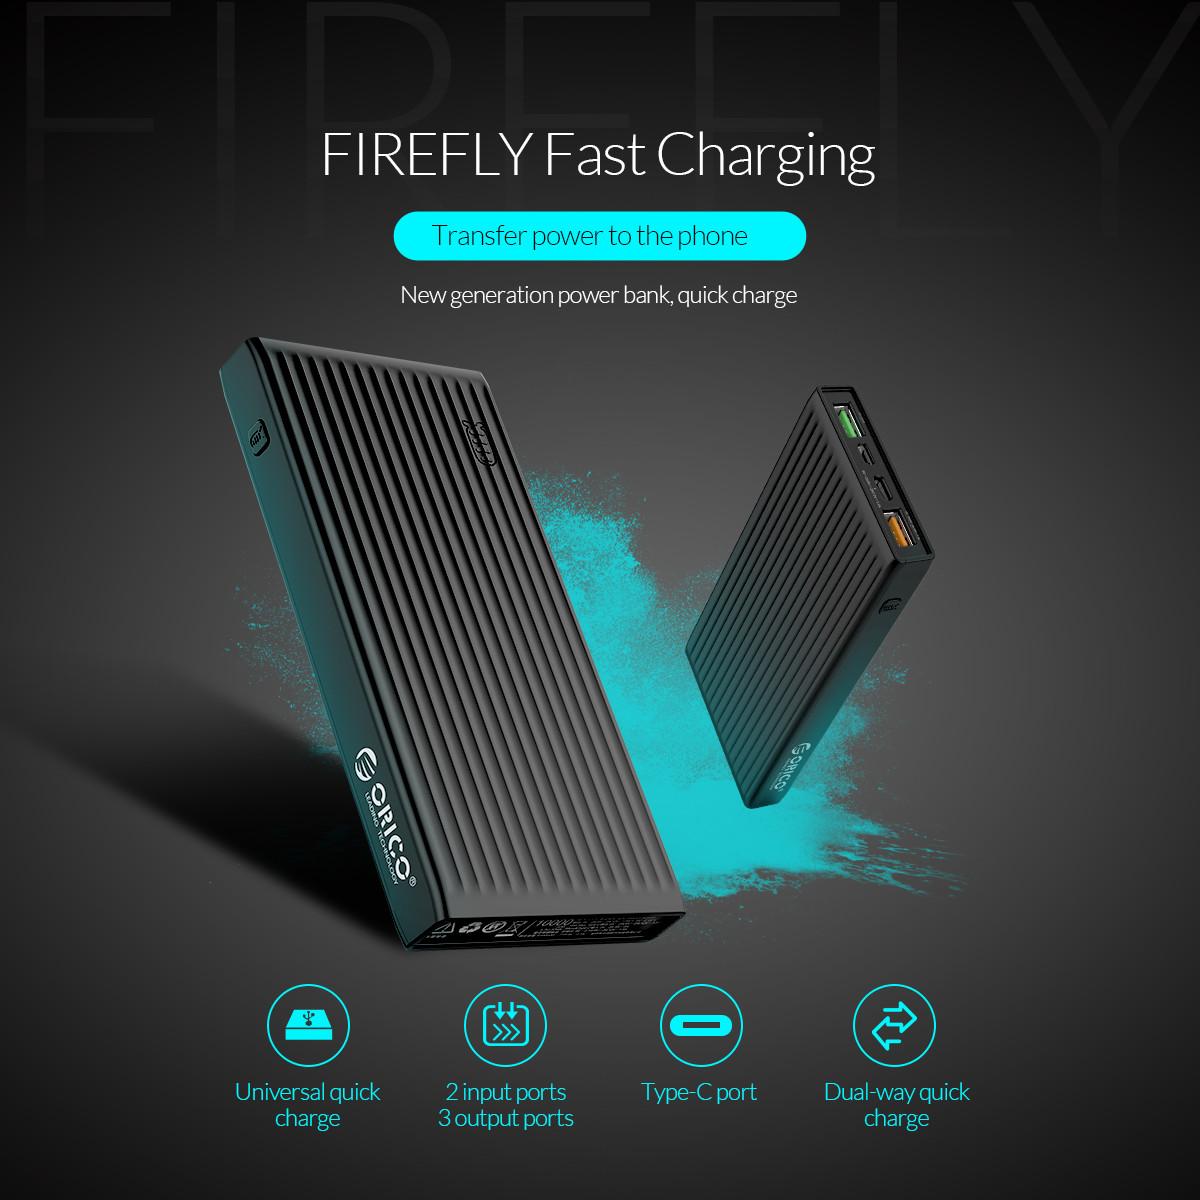 FIREFLY-K10000